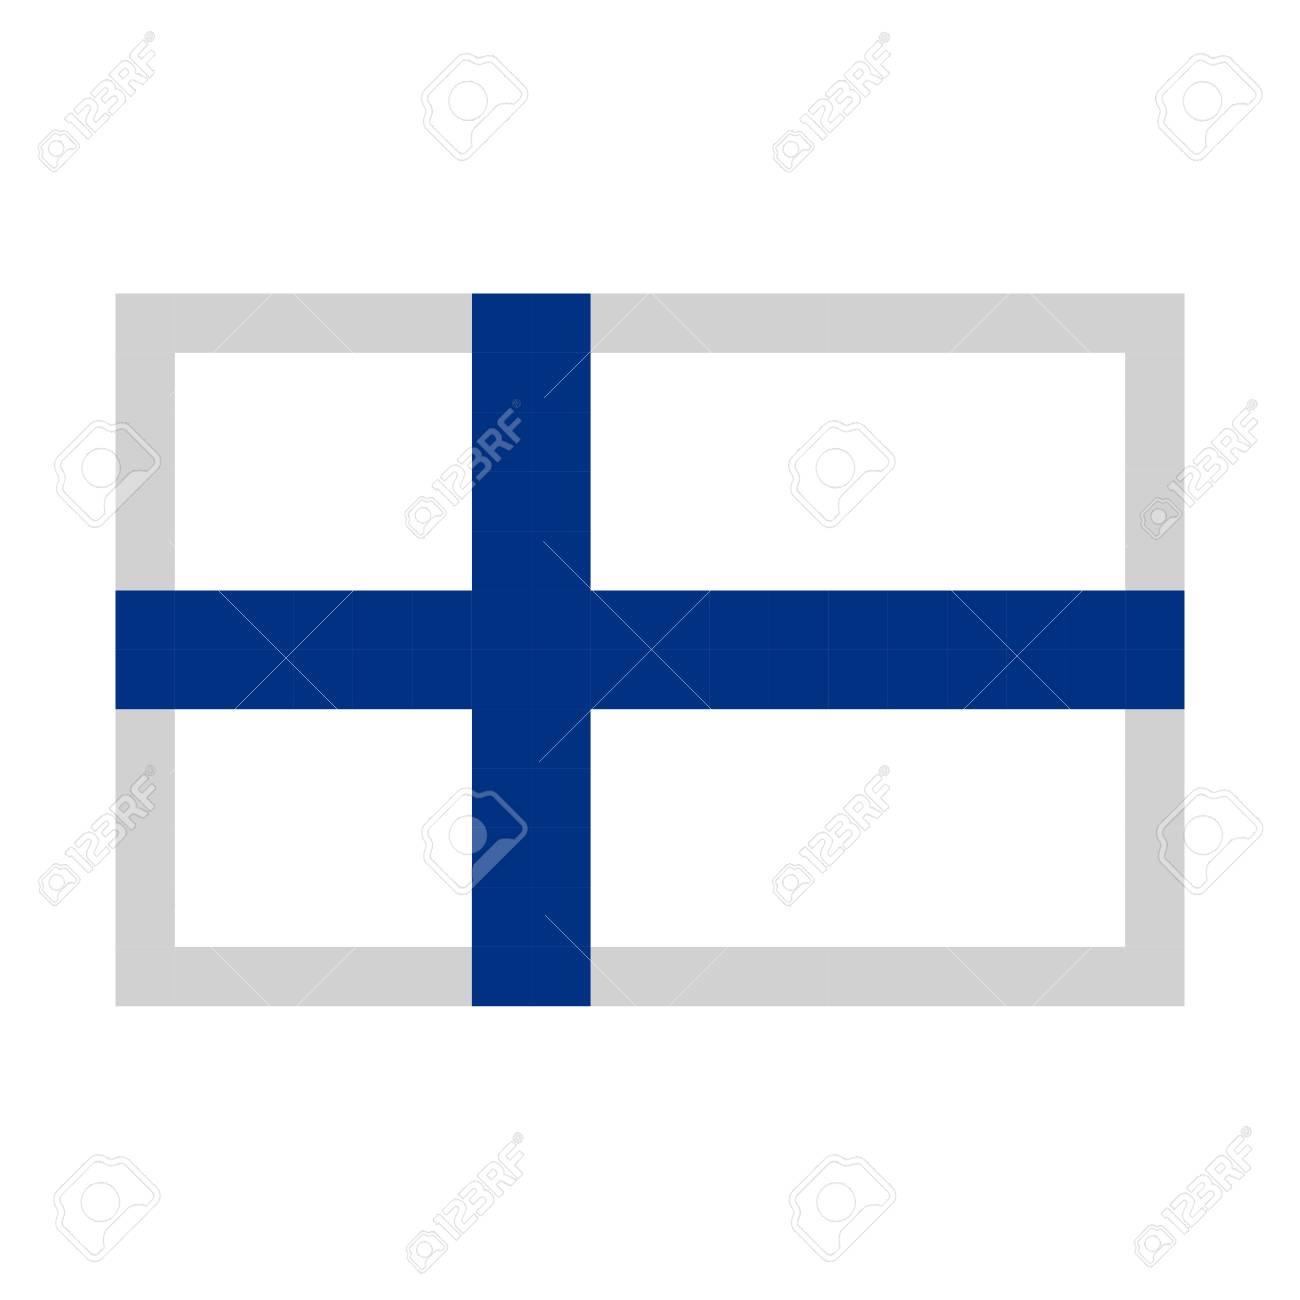 Drapeau De La Finlande Pixel Art Cartoon Style De Jeu Retro Defini Clip Art Libres De Droits Vecteurs Et Illustration Image 94430867